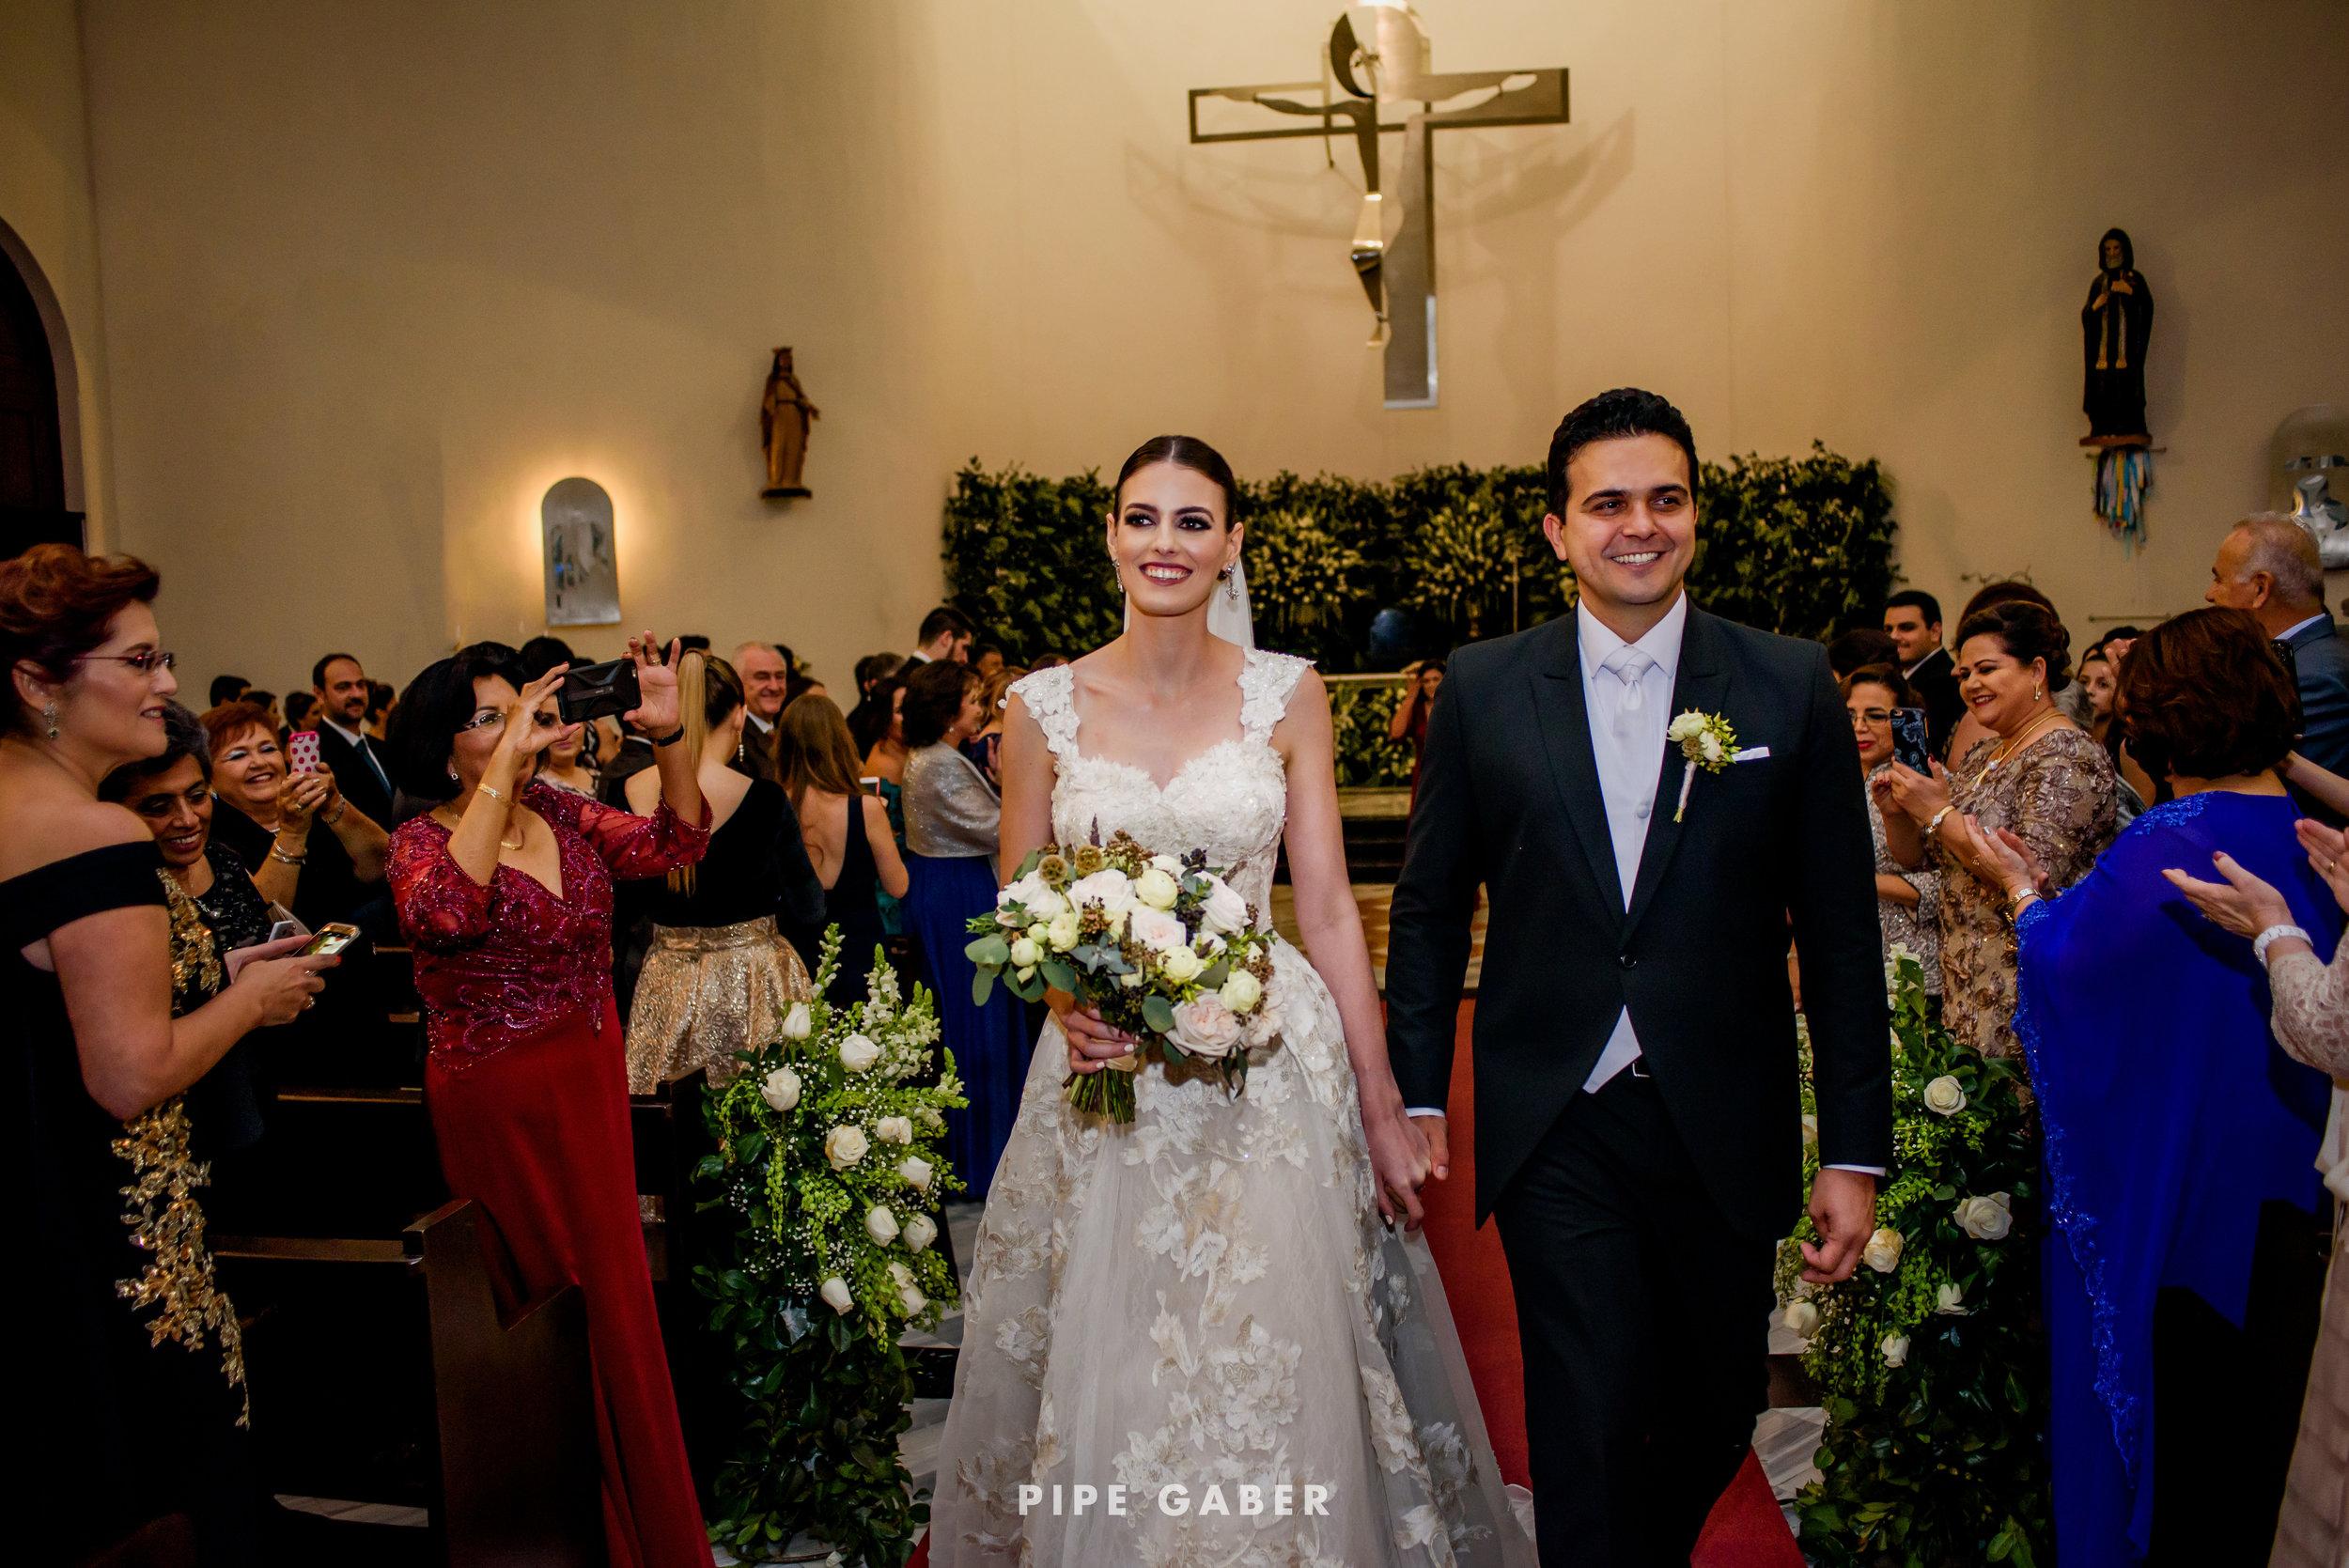 18_02_03_WEDDING_ALEXIS_ABIMERHI_ERICK_APT_2012.jpg